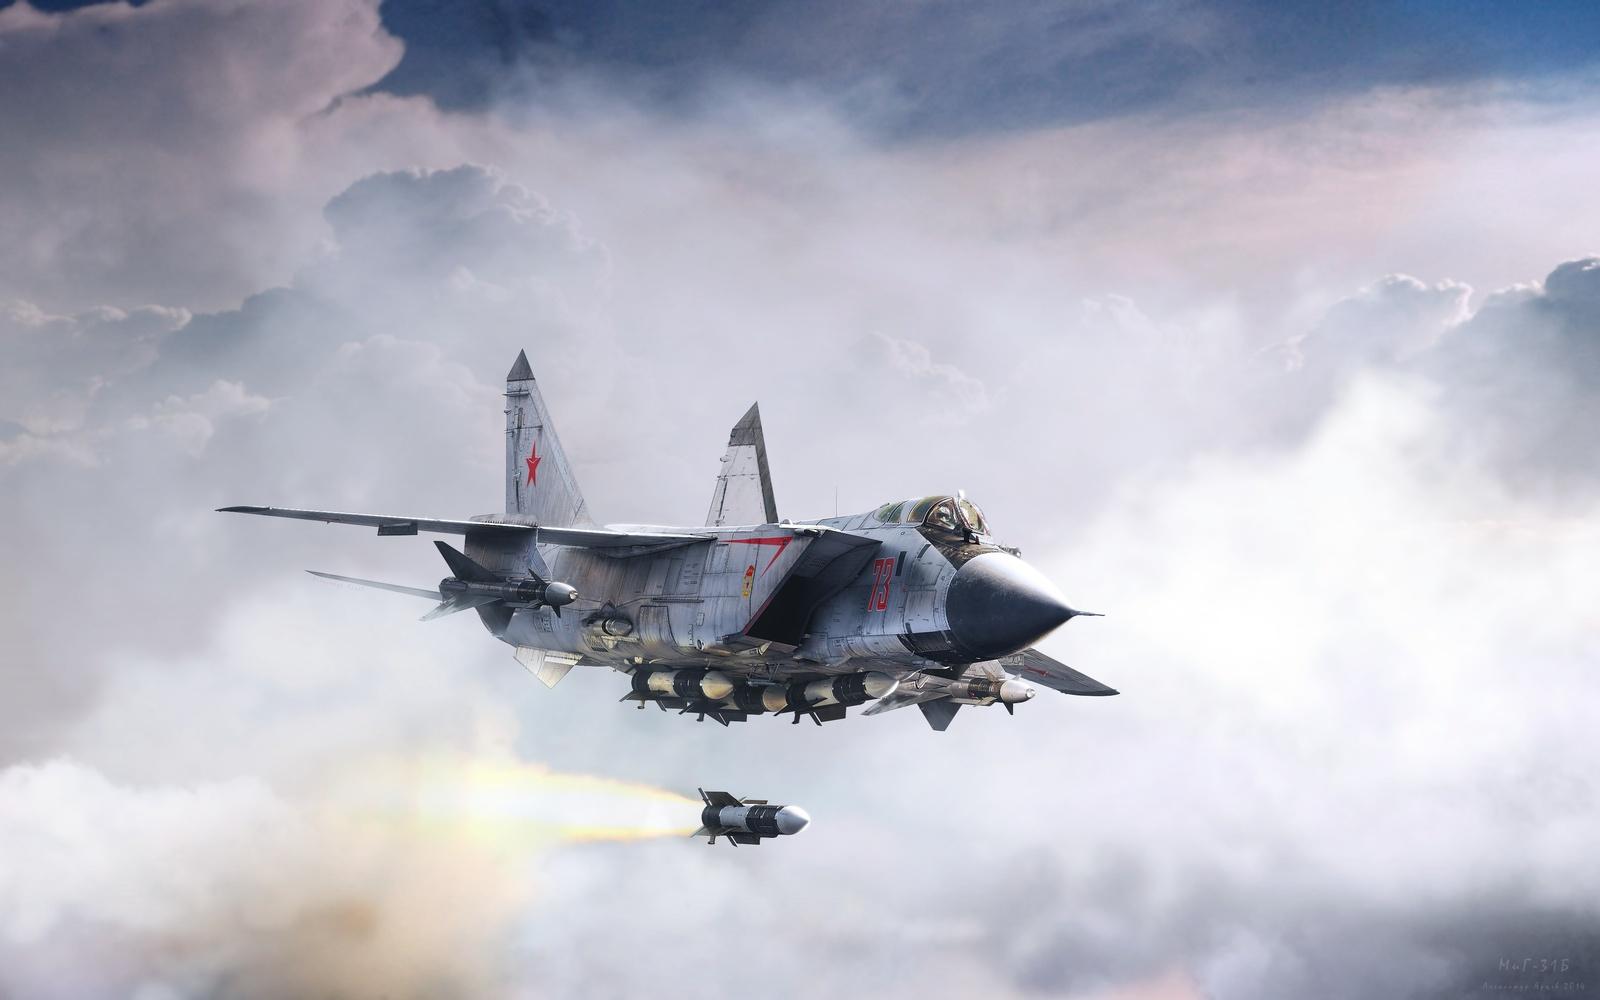 Обои Mcdonnell douglas, истребитель, Самолёт, eagle, Облака. Авиация foto 18